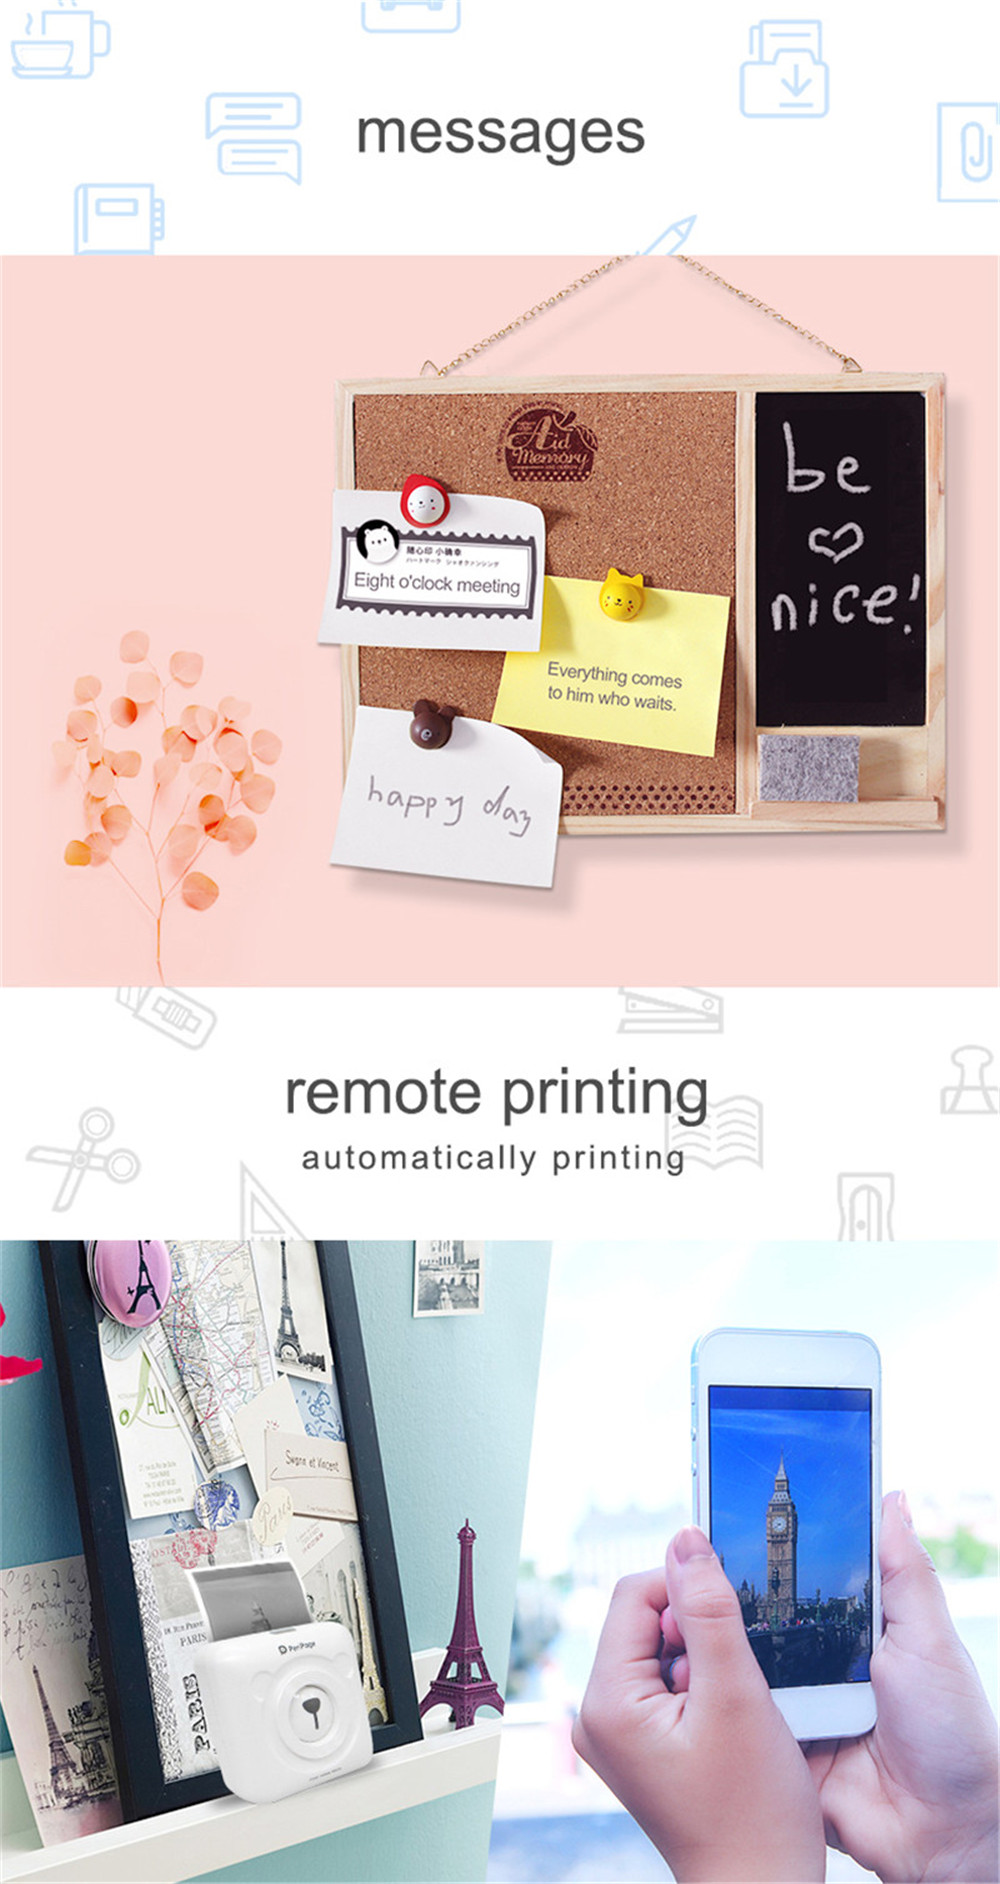 GOOJPRT peripage photo printers (6)